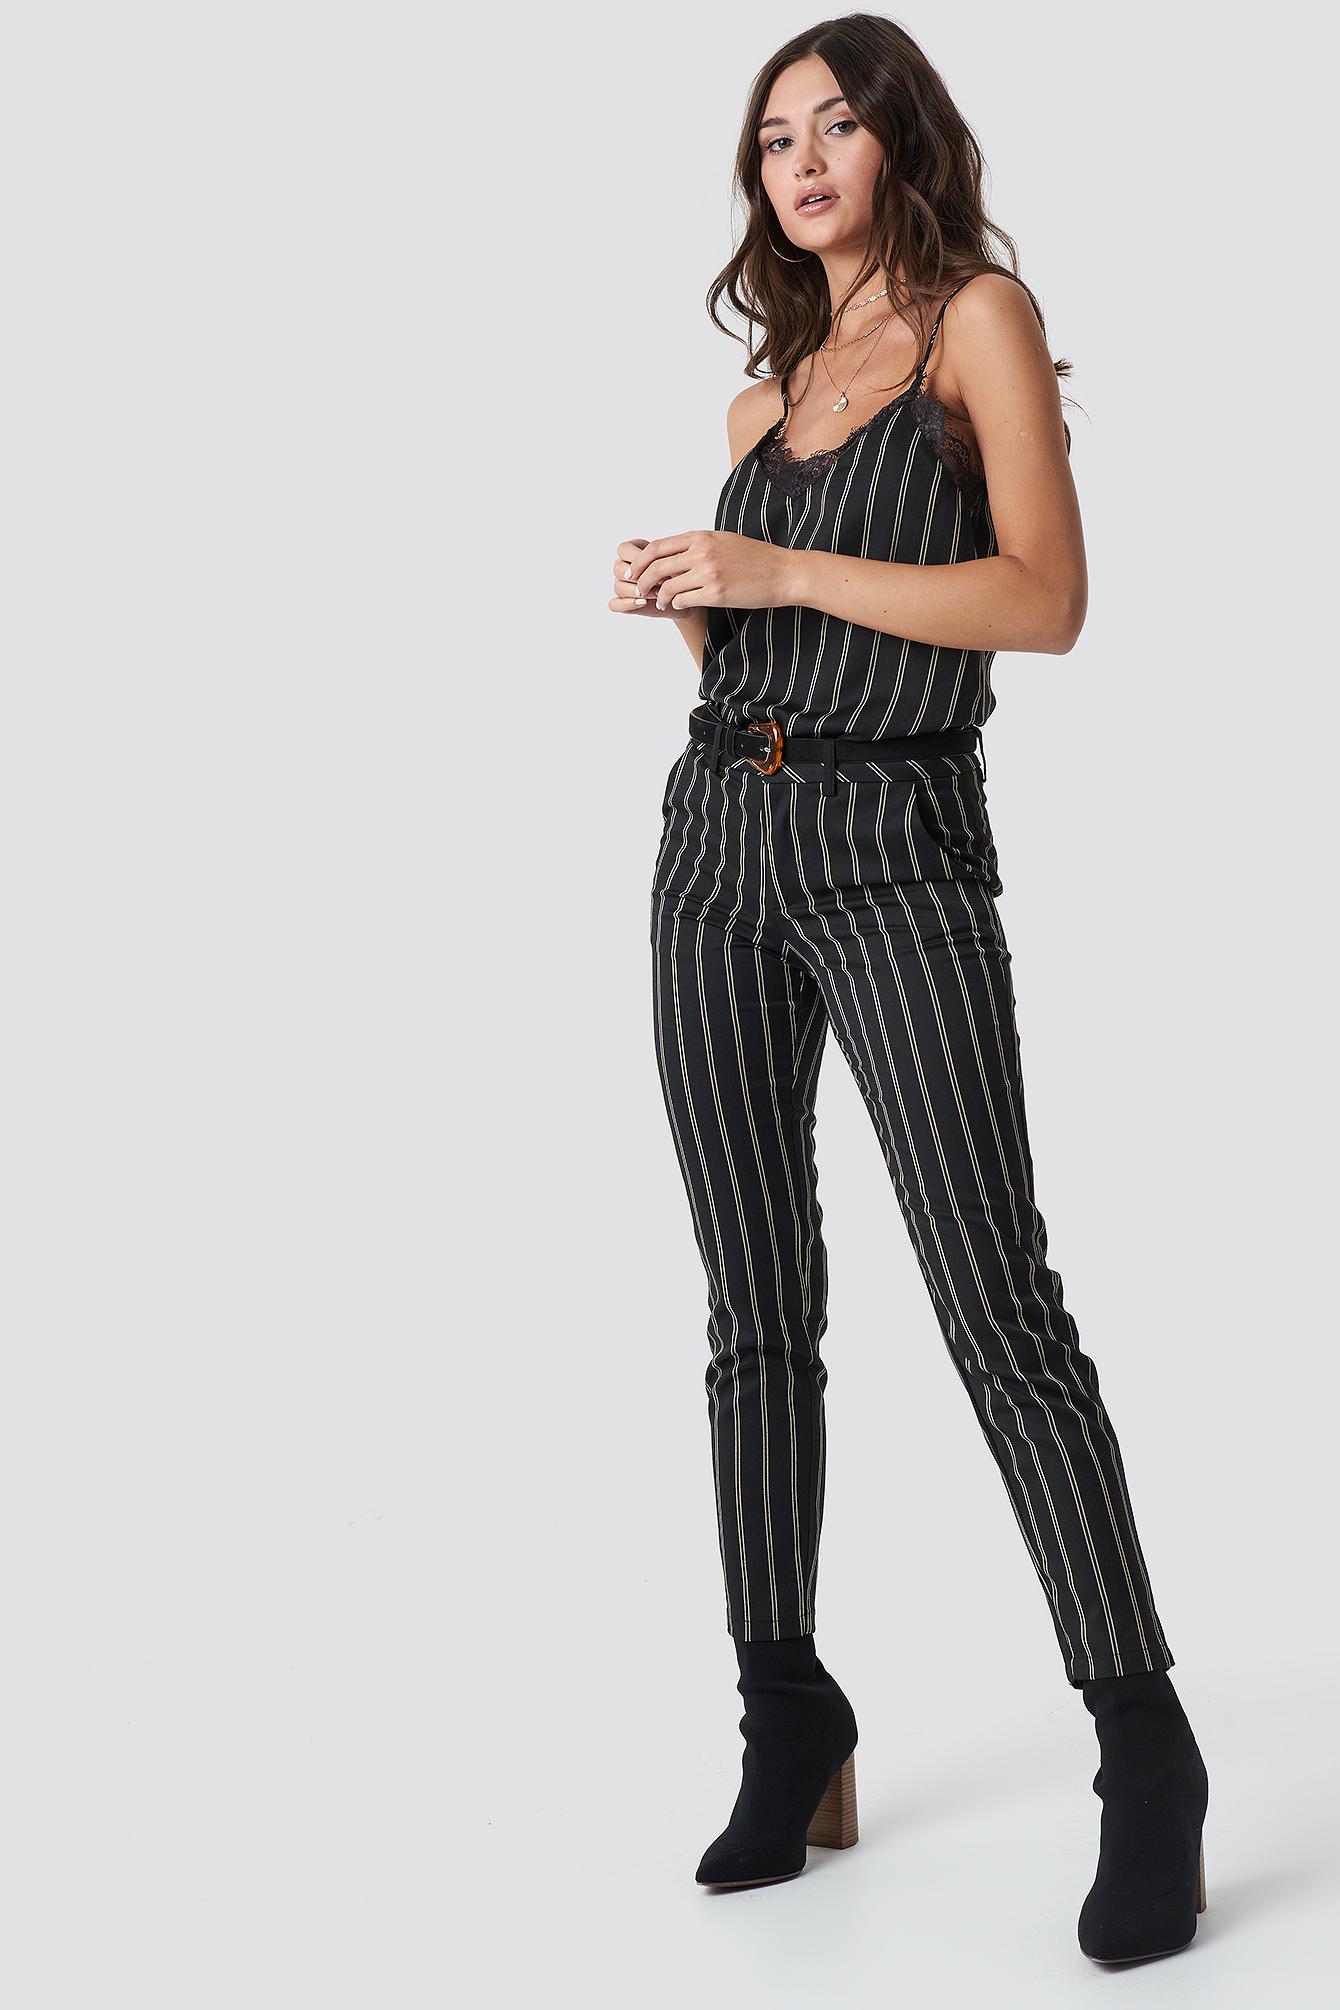 rut&circle -  Malin Stripe Pant - Grey